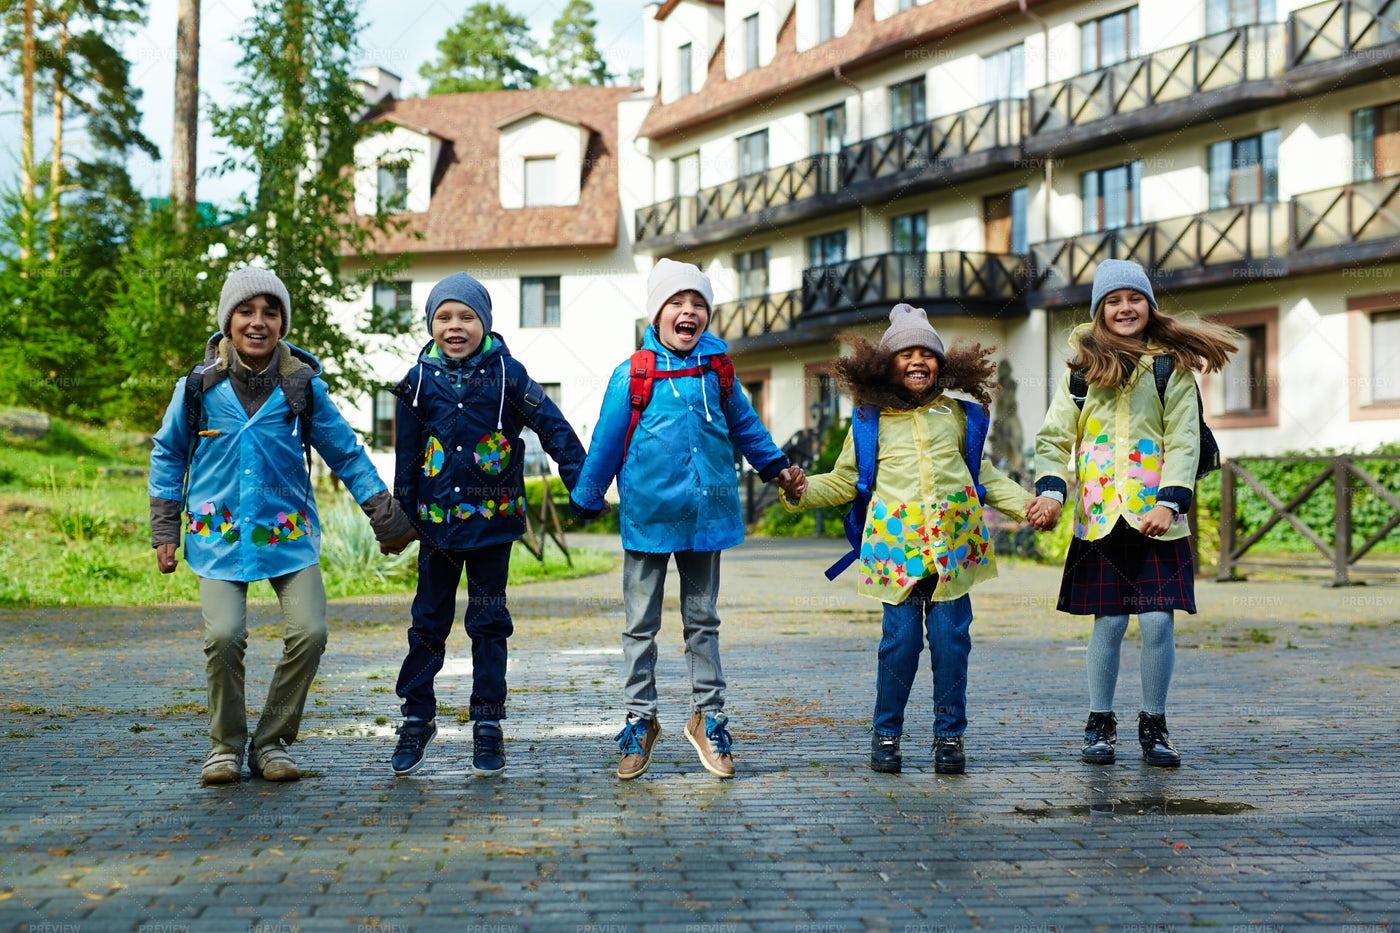 Happy Kids Going To School: Stock Photos